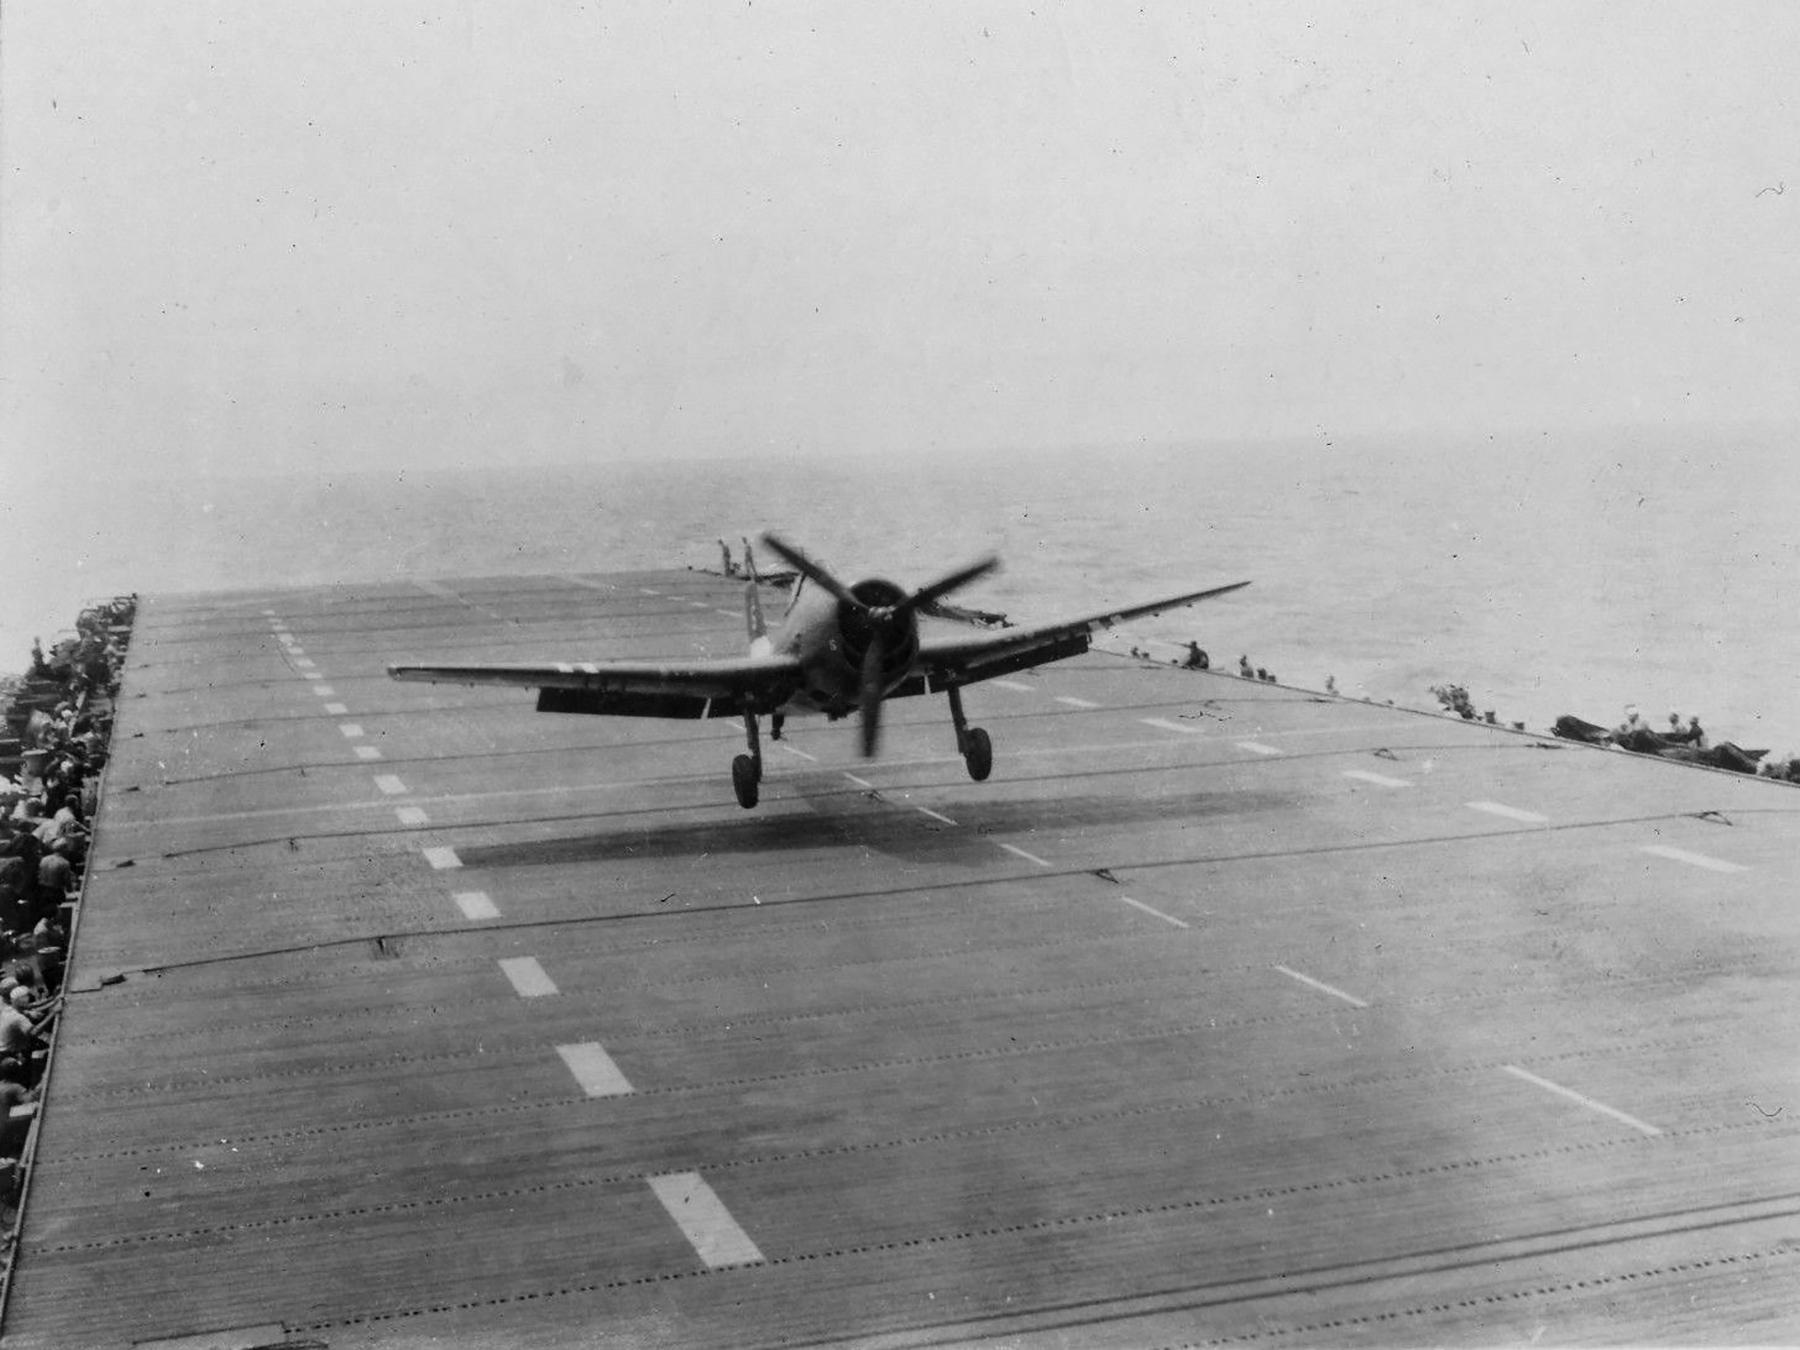 Grumman F6F 5 Hellcat VF 36 White 5 landing mishap CVE 112 USS Siboney Aug 1945 May 1946 01